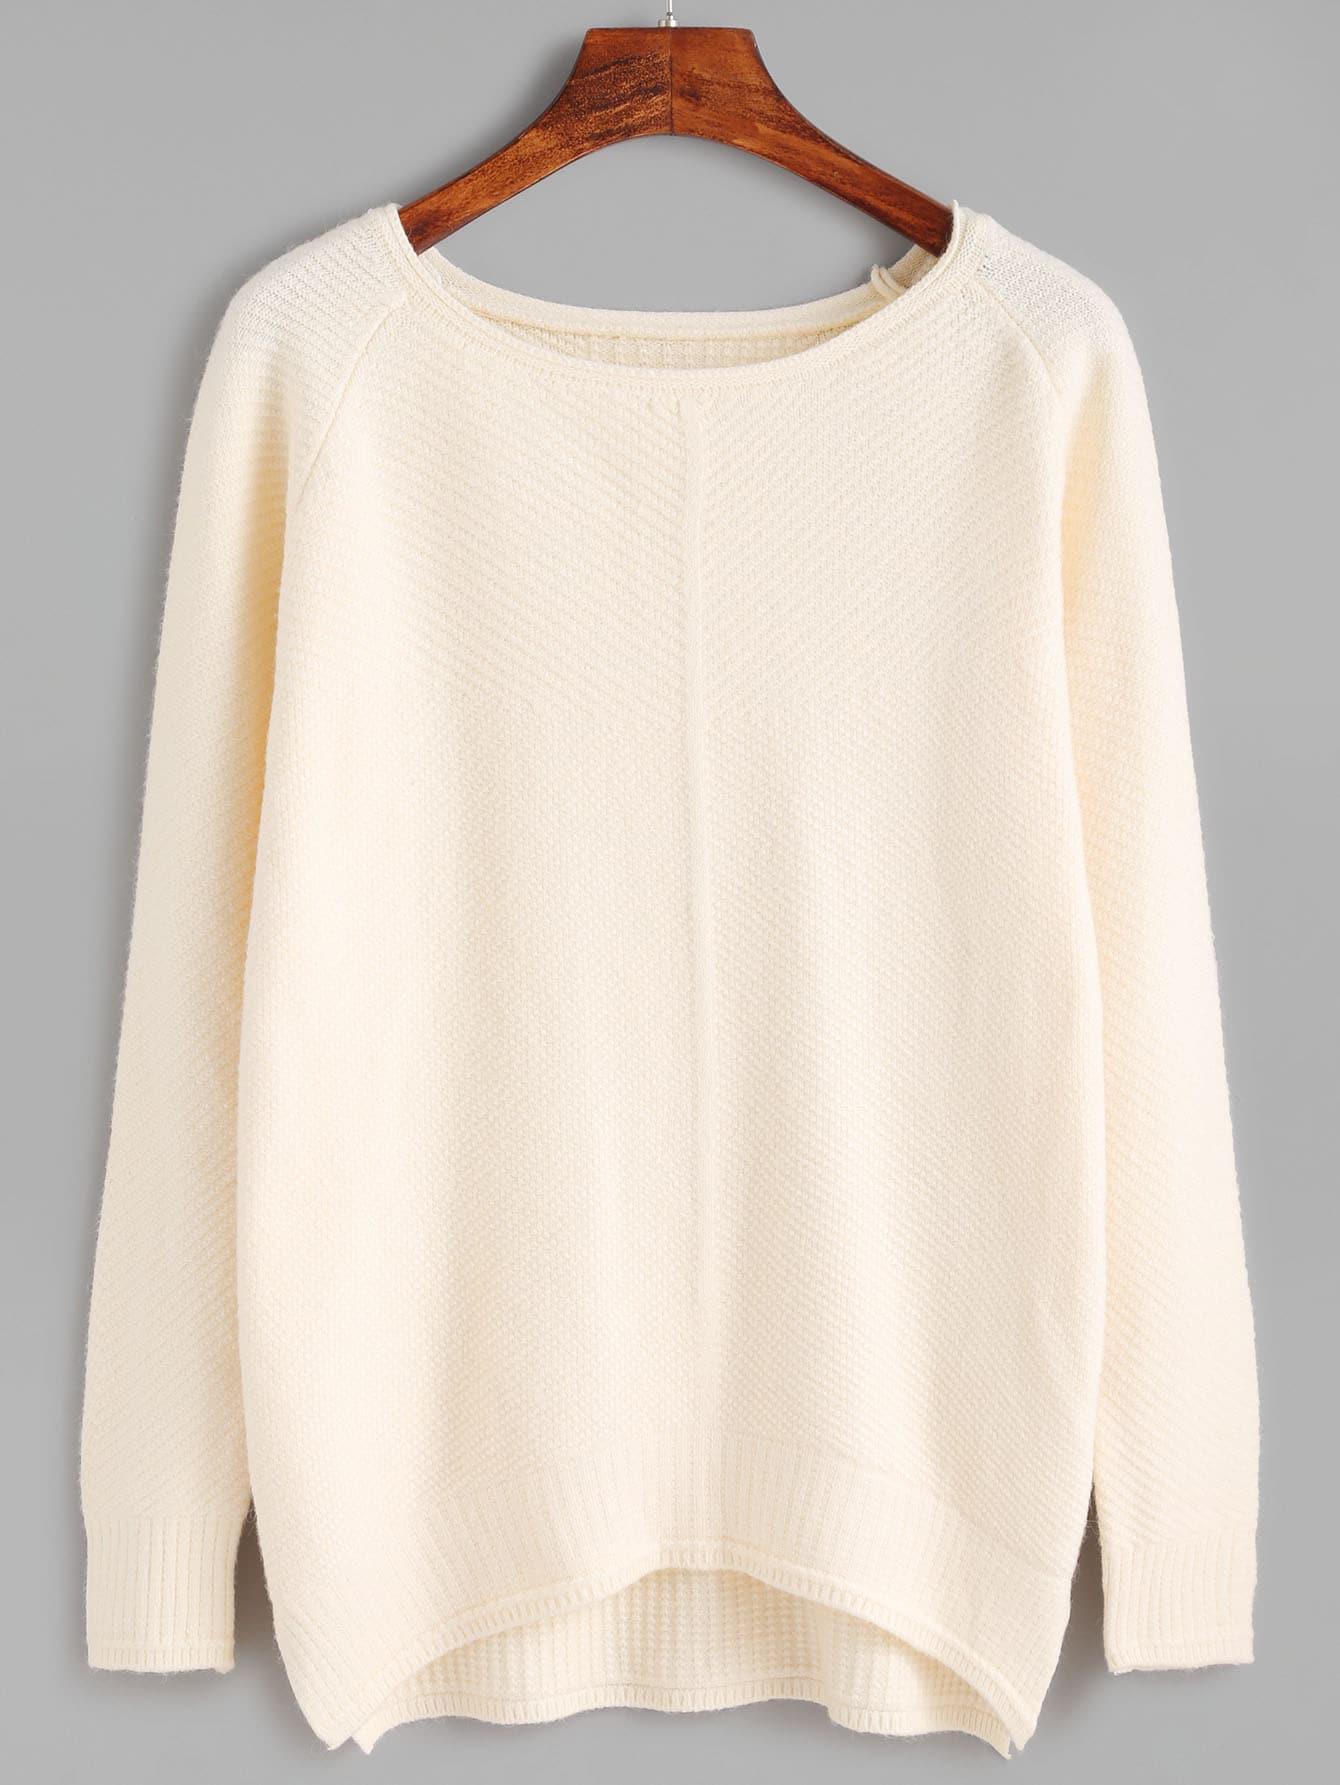 Apricot Raglan Sleeve Dip Hem Sweater sweater160928101